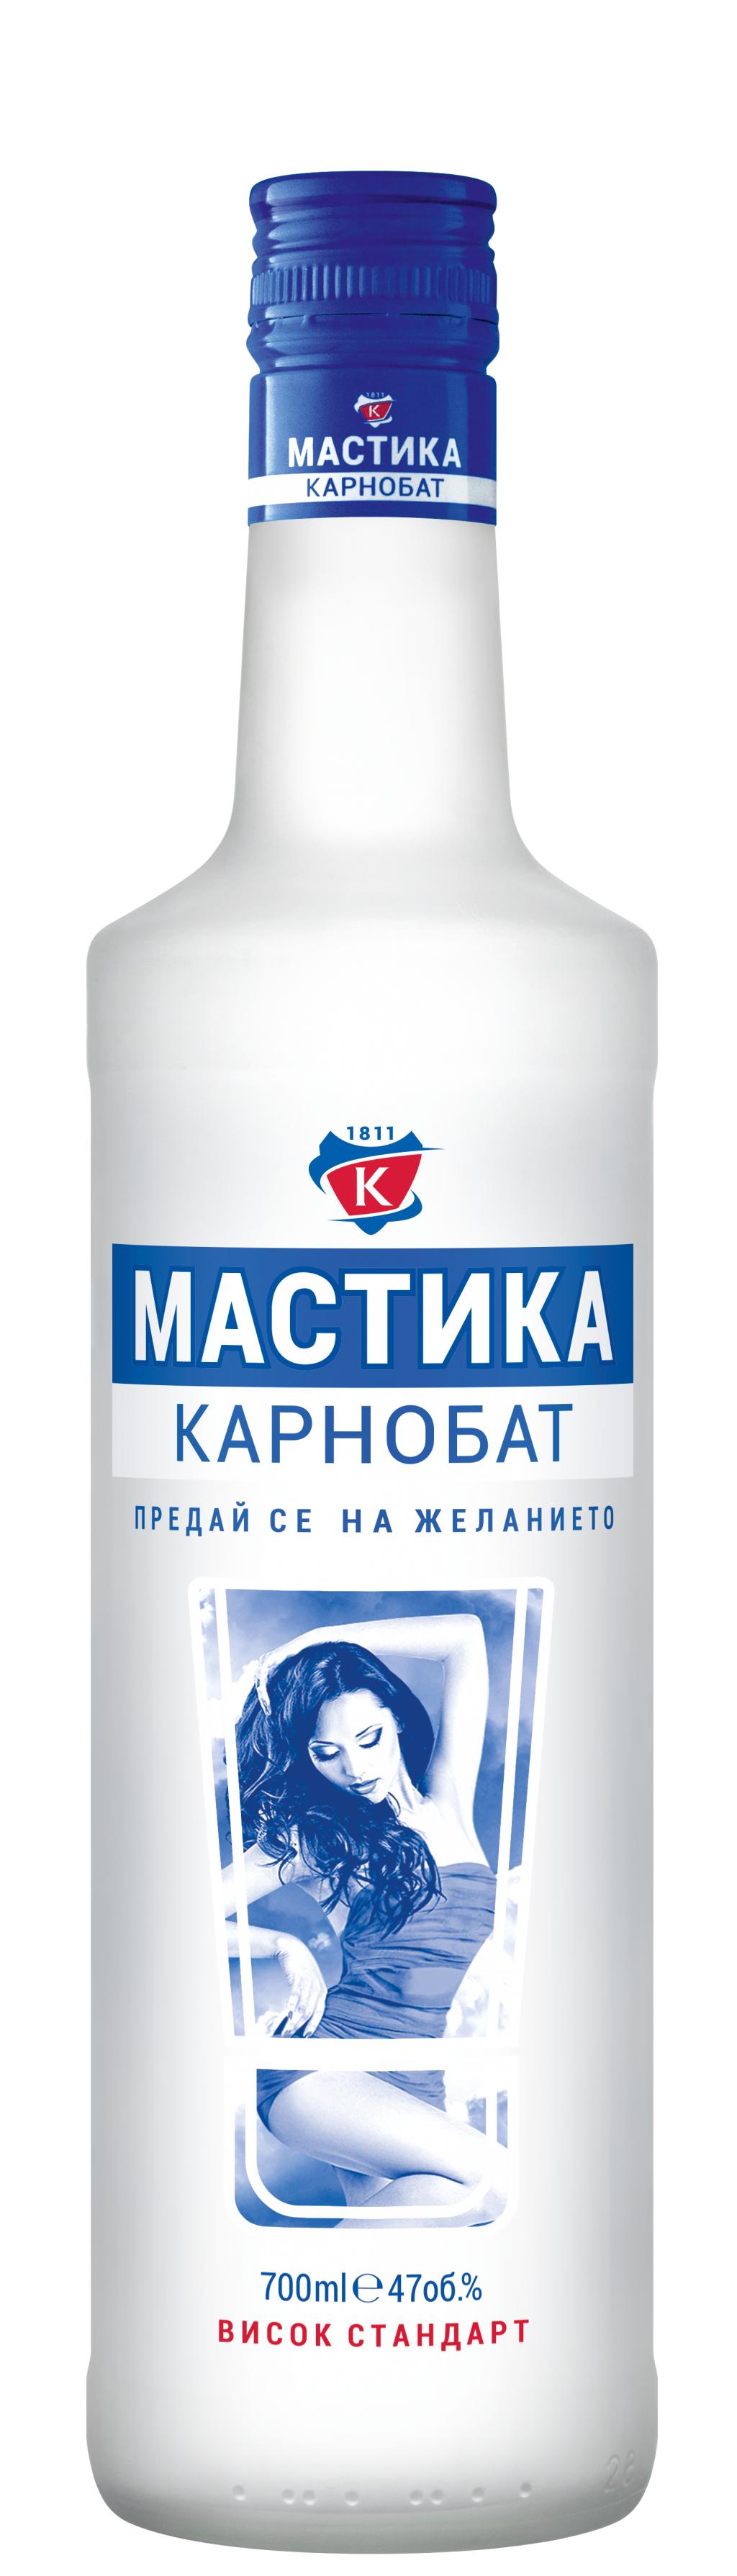 Мастика Карнобат 0.7 л